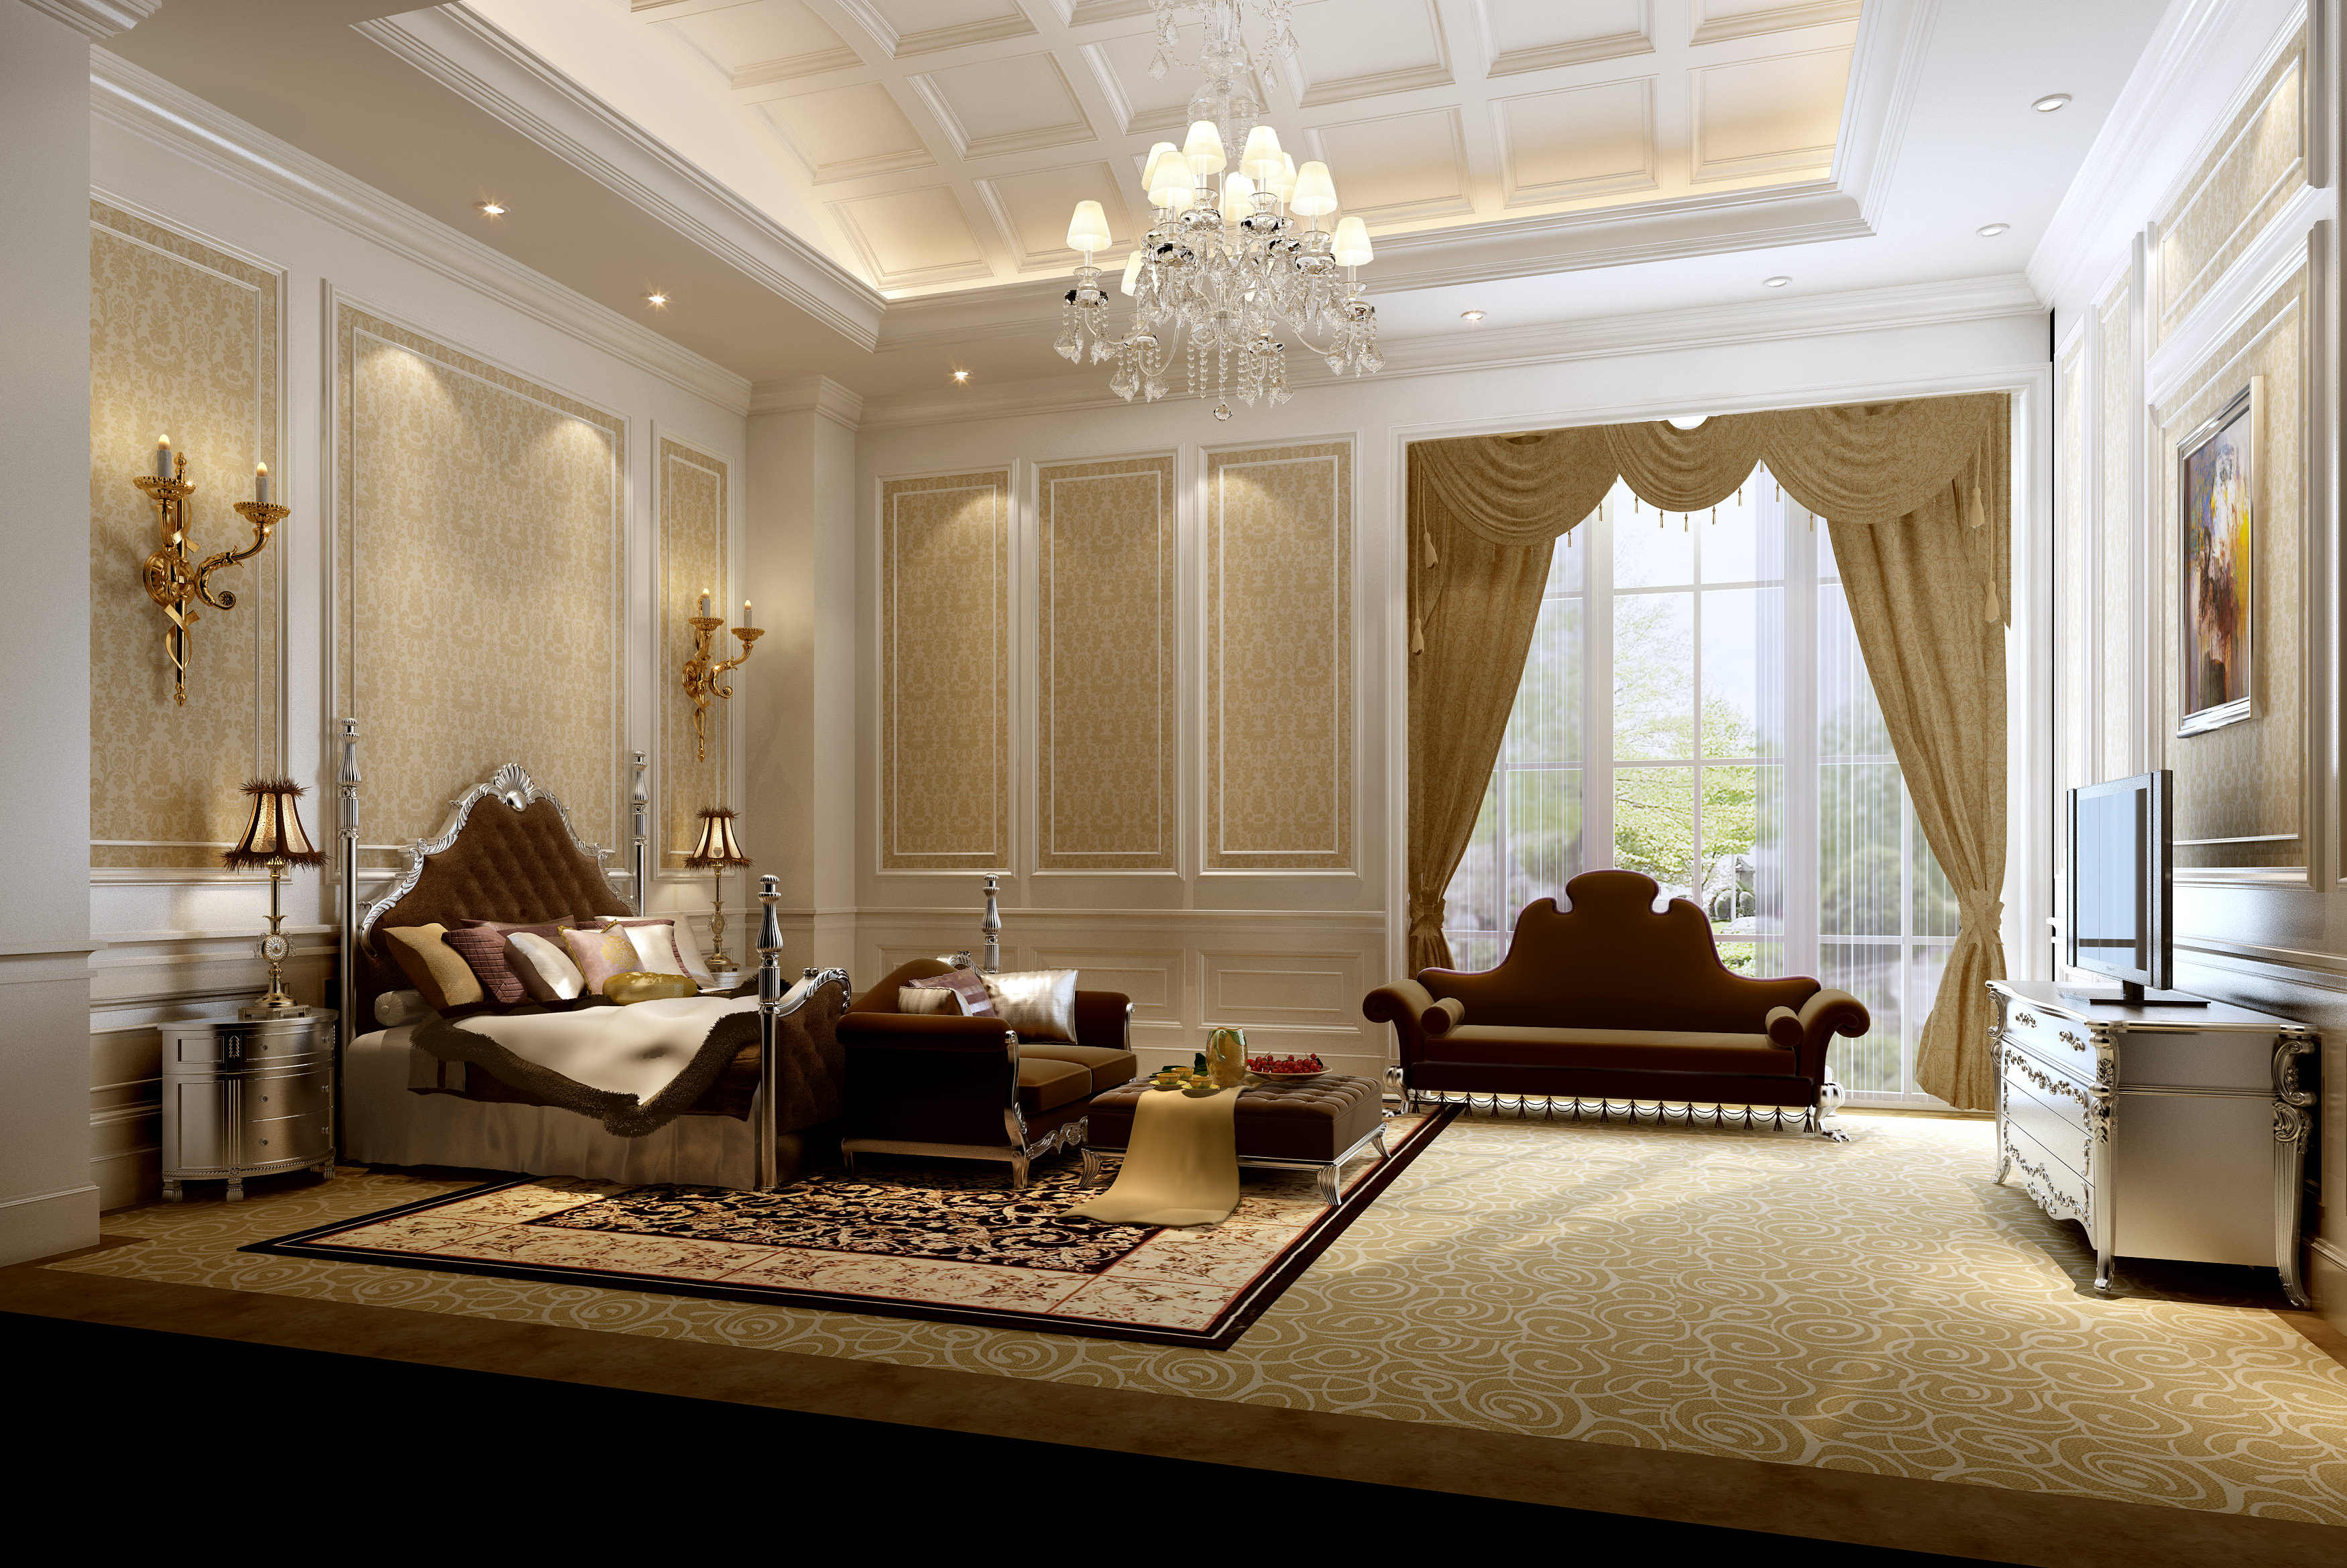 Very Luxury Bedroom D Model Max Cgtrader Com